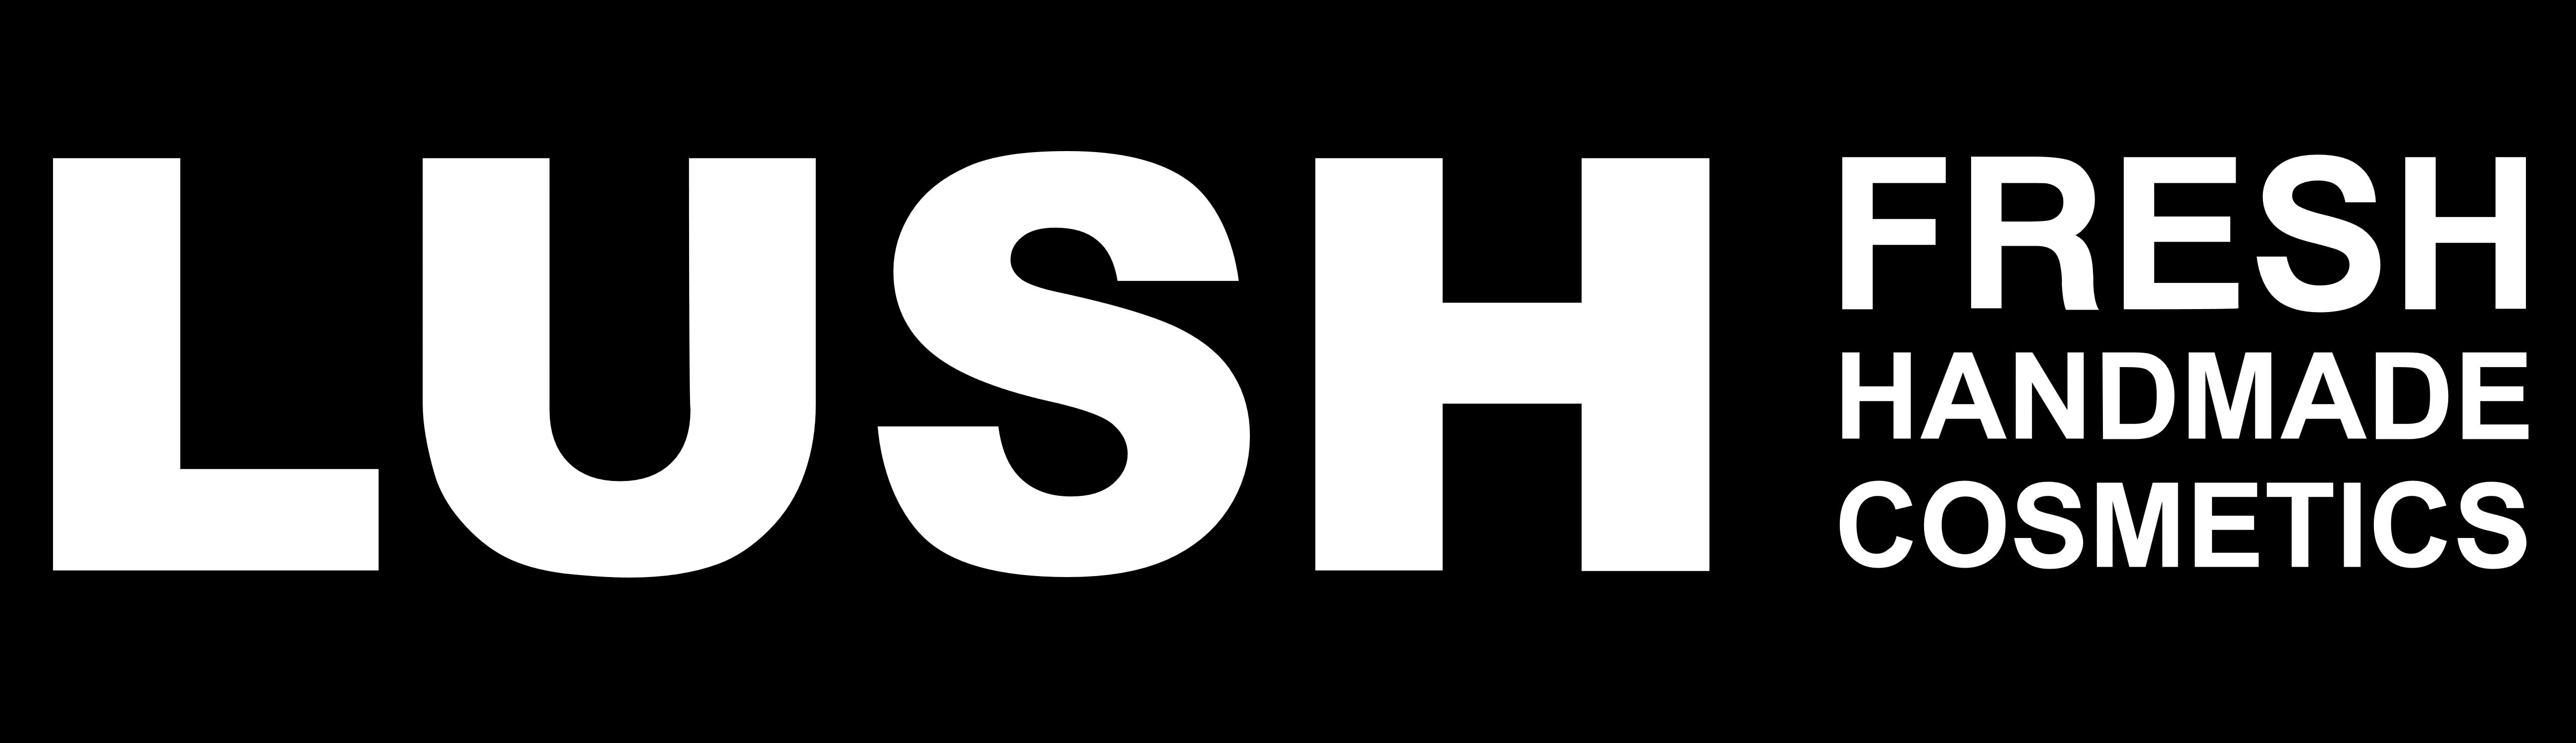 Lush_logo_black